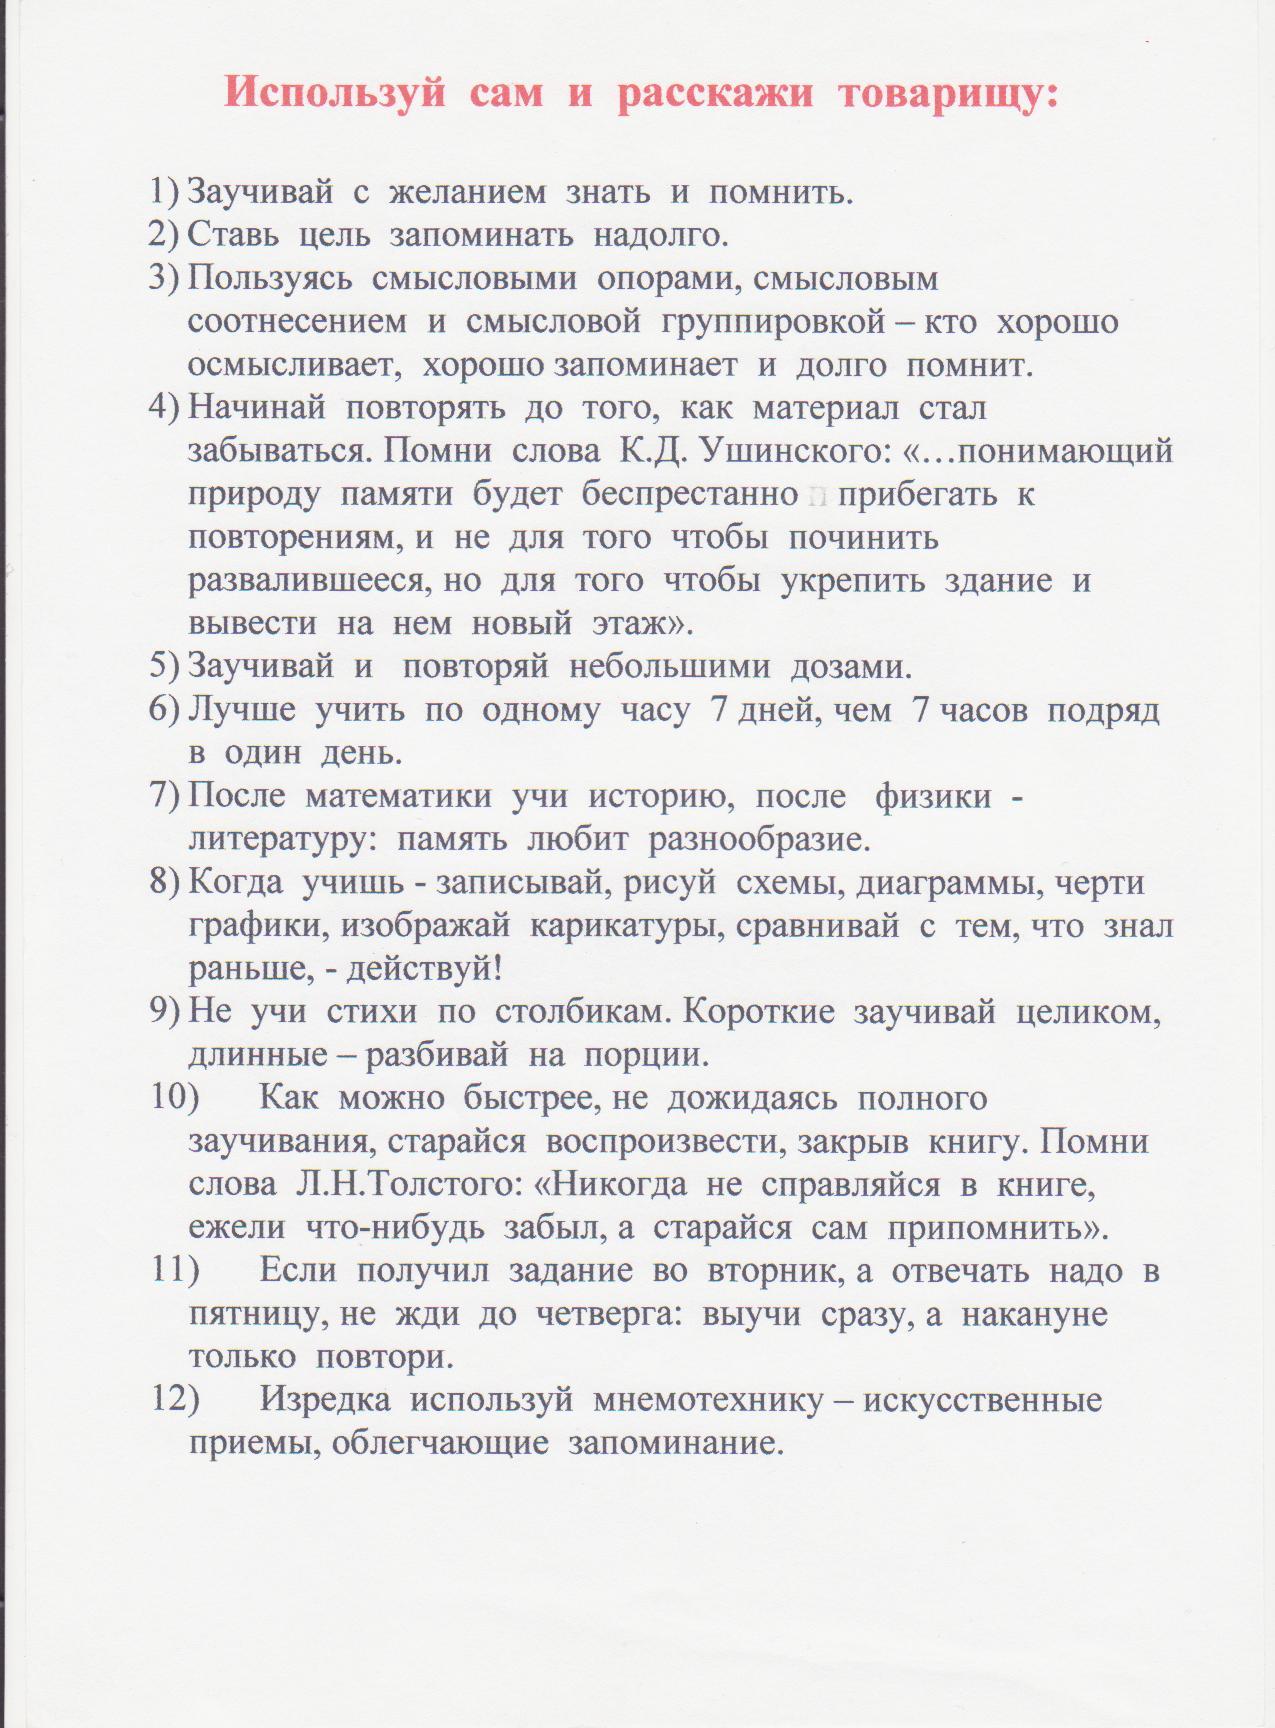 C:\Users\Юля\Desktop\Кузнецова аттестация\сканированные грамоты\Кузнецова 060.jpg